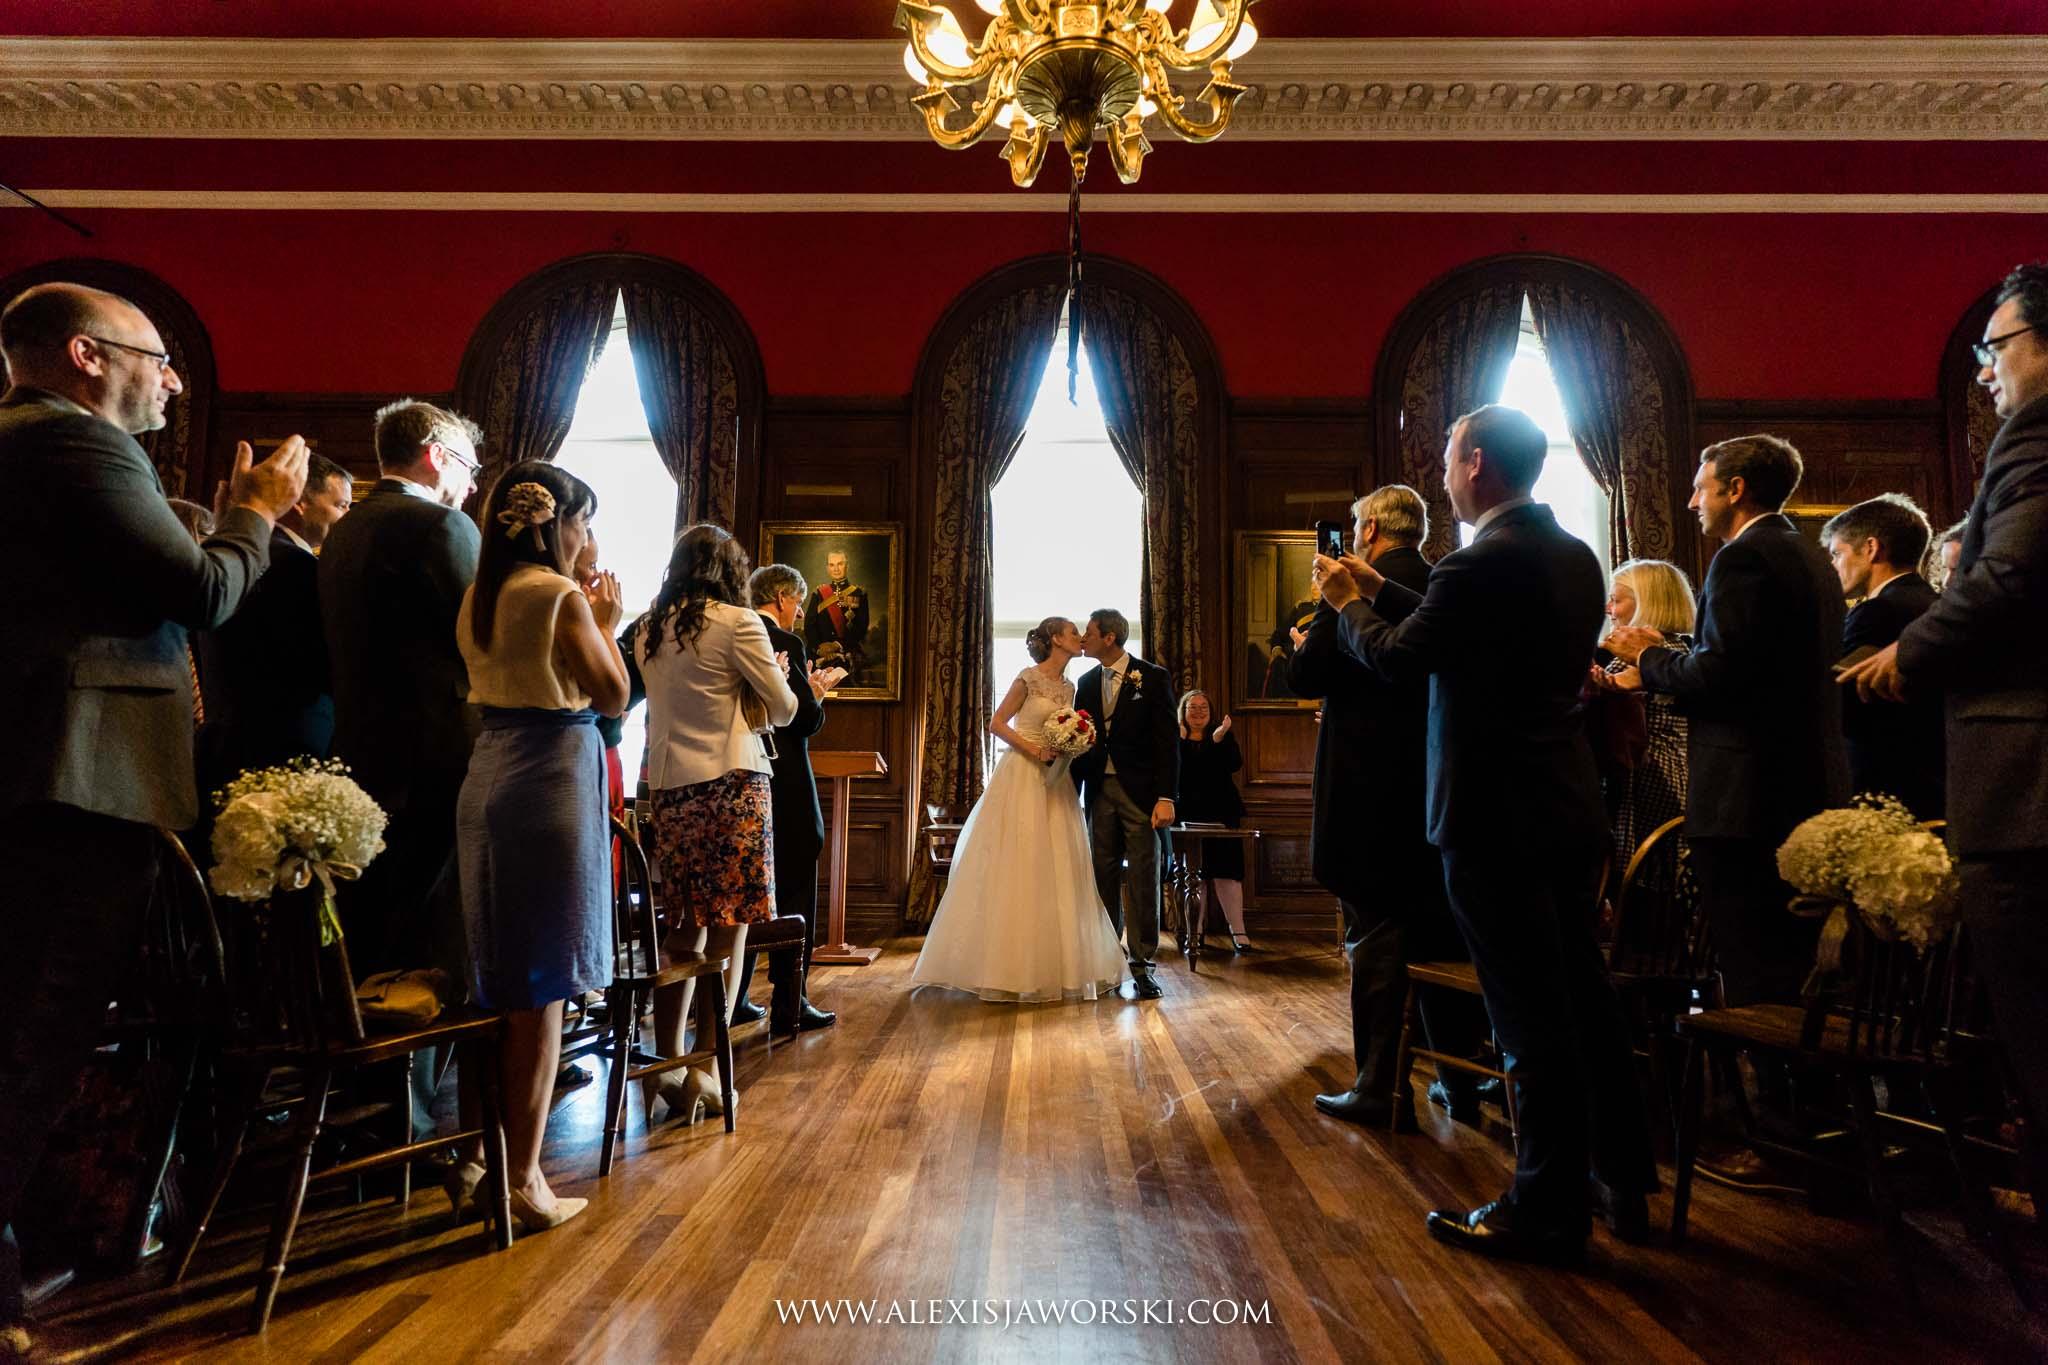 bride and groom kiss before leaving